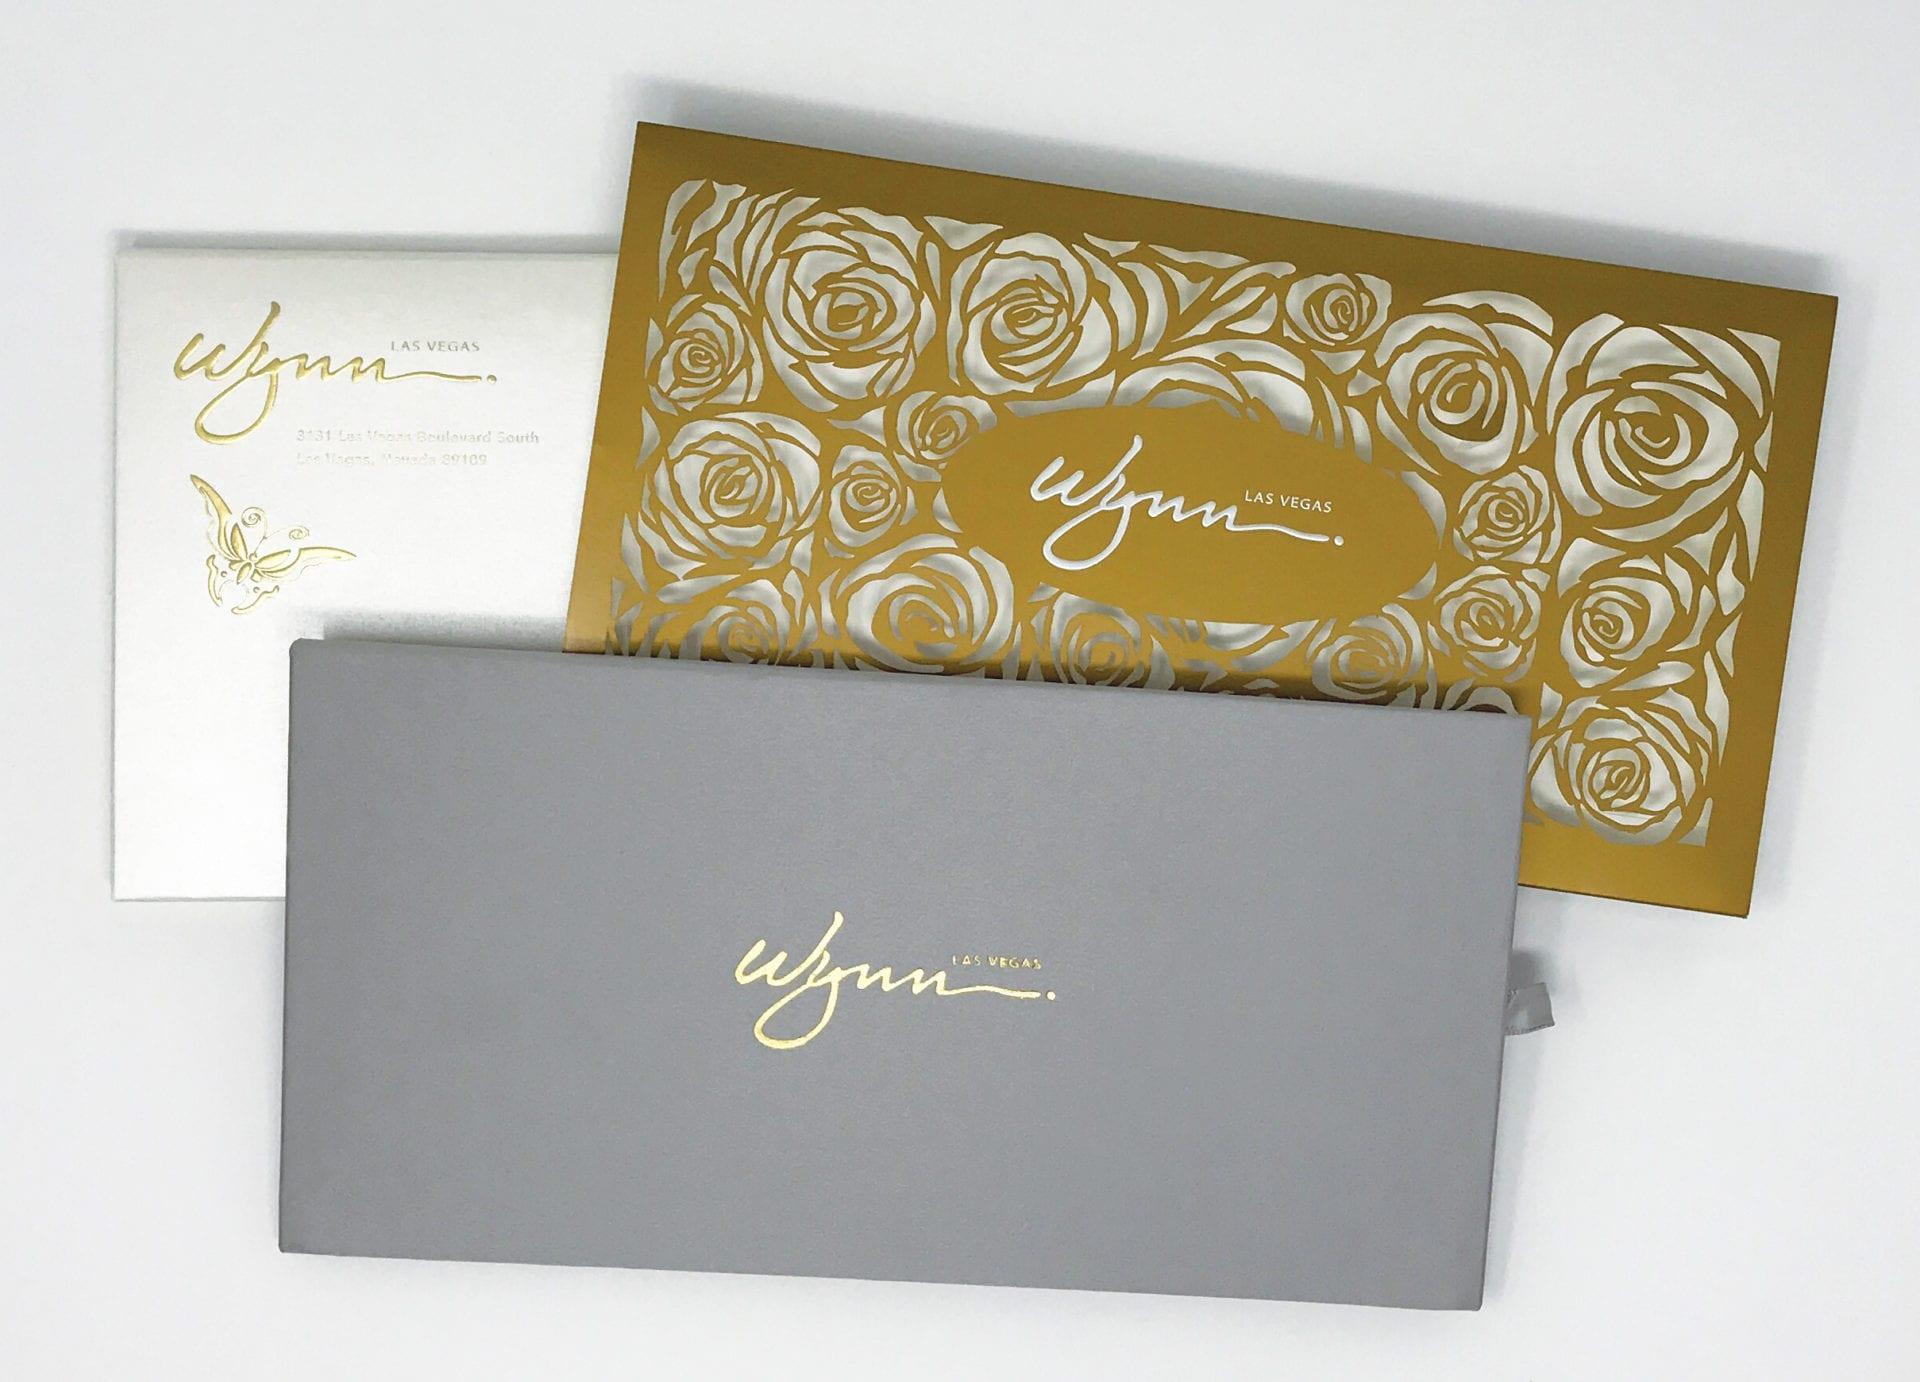 Wynn Las Vegas branded envelopes